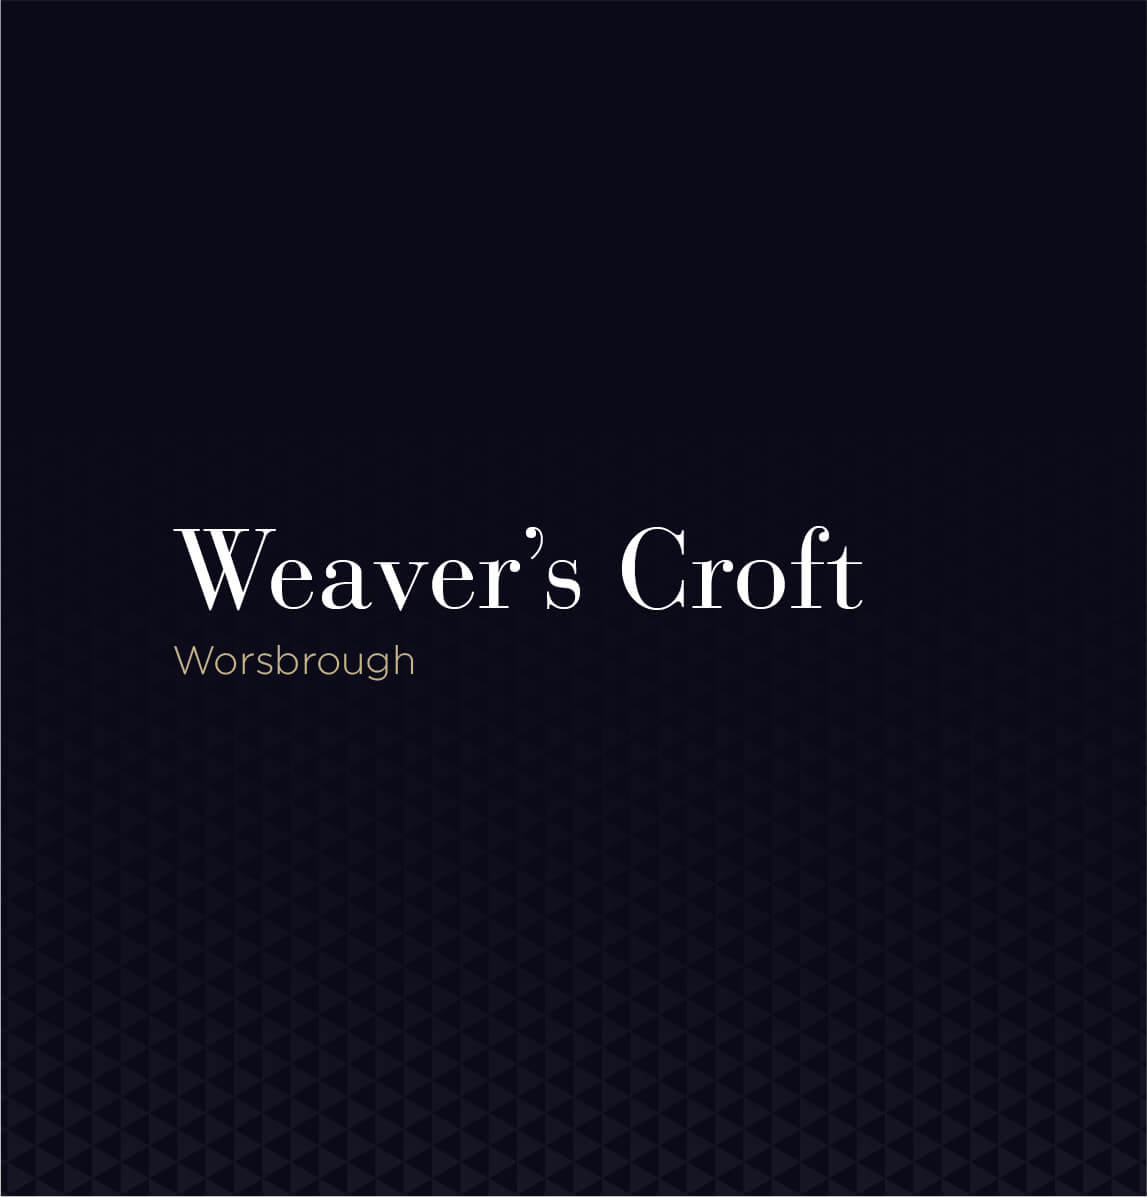 Weavers Croft, Worsbrough